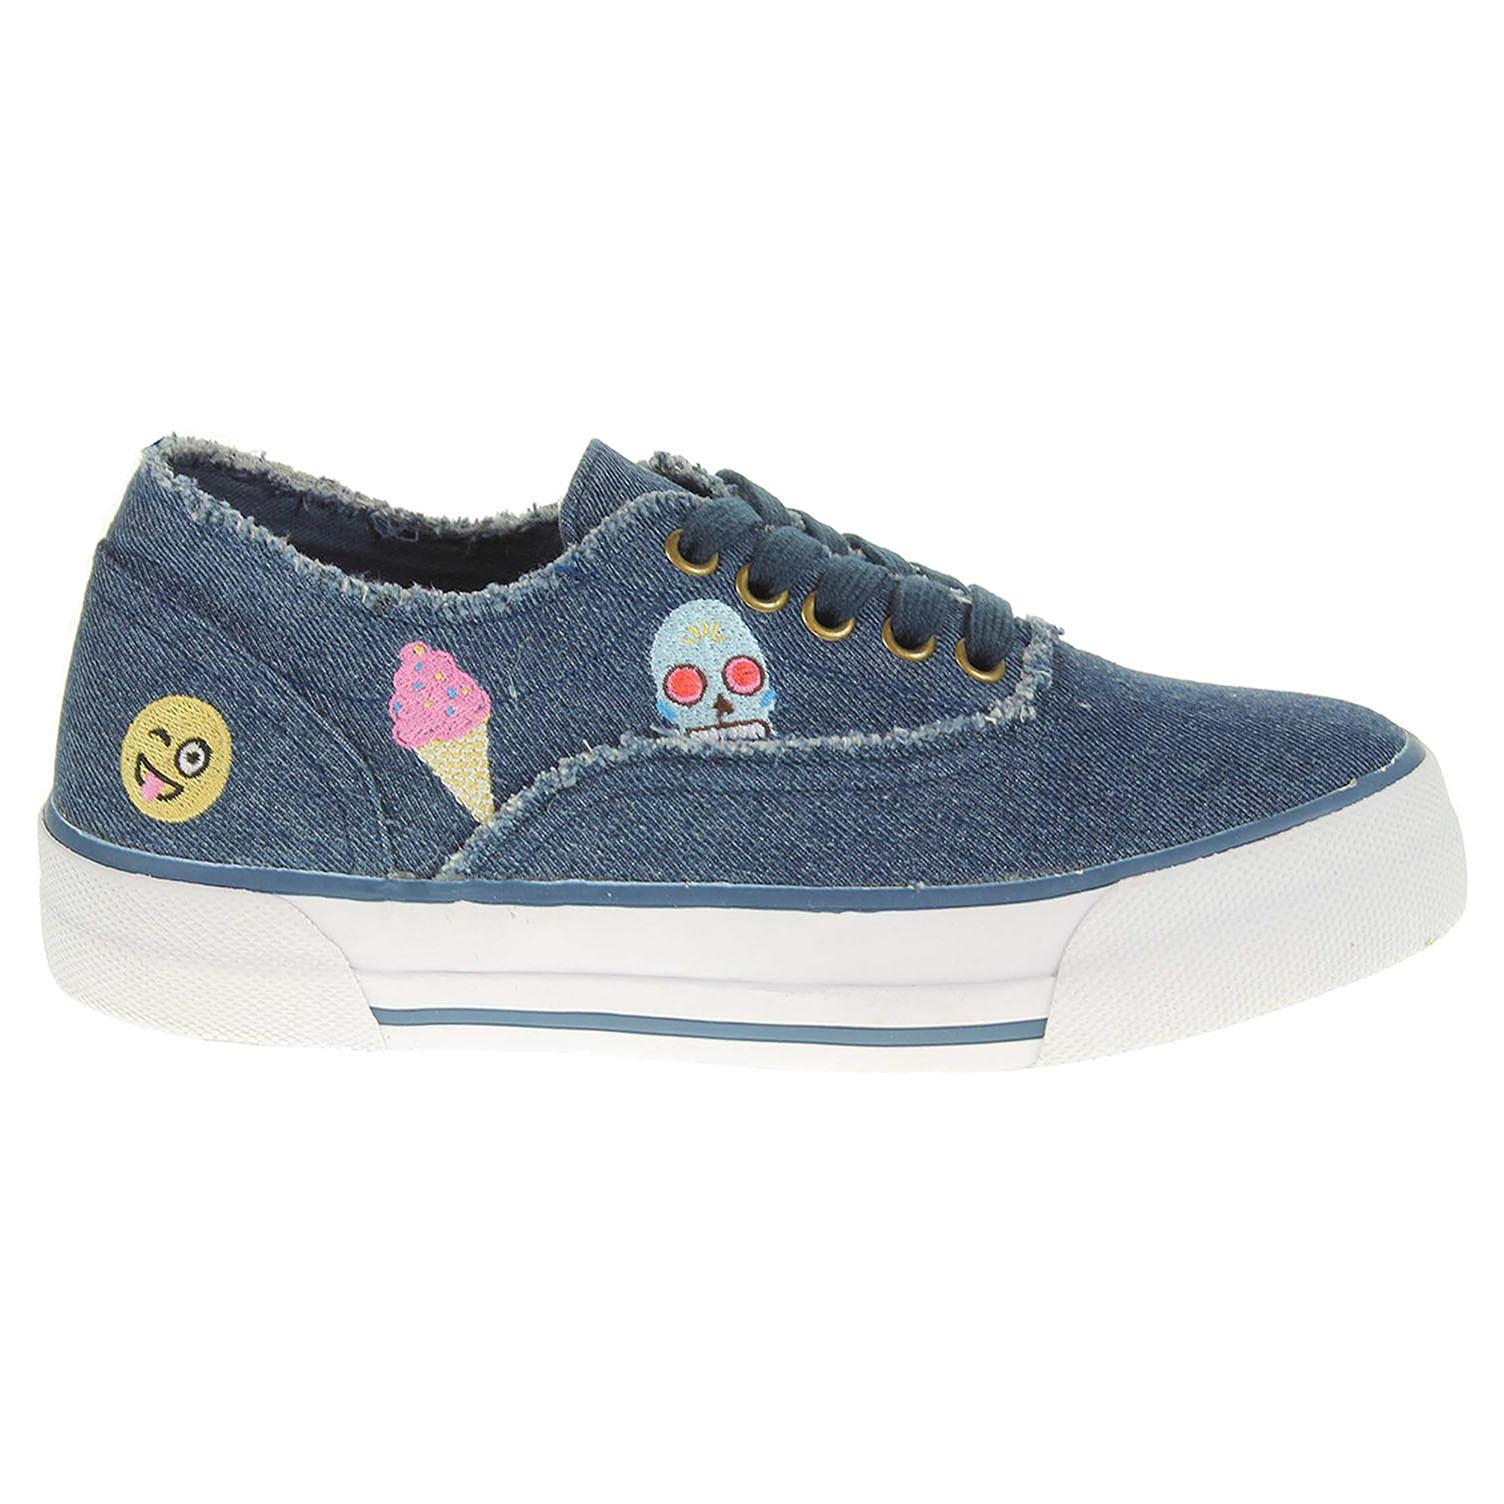 Ecco Marco Tozzi dámská obuv 2-23624-38 modrá 23200647 c6320ffc3fd